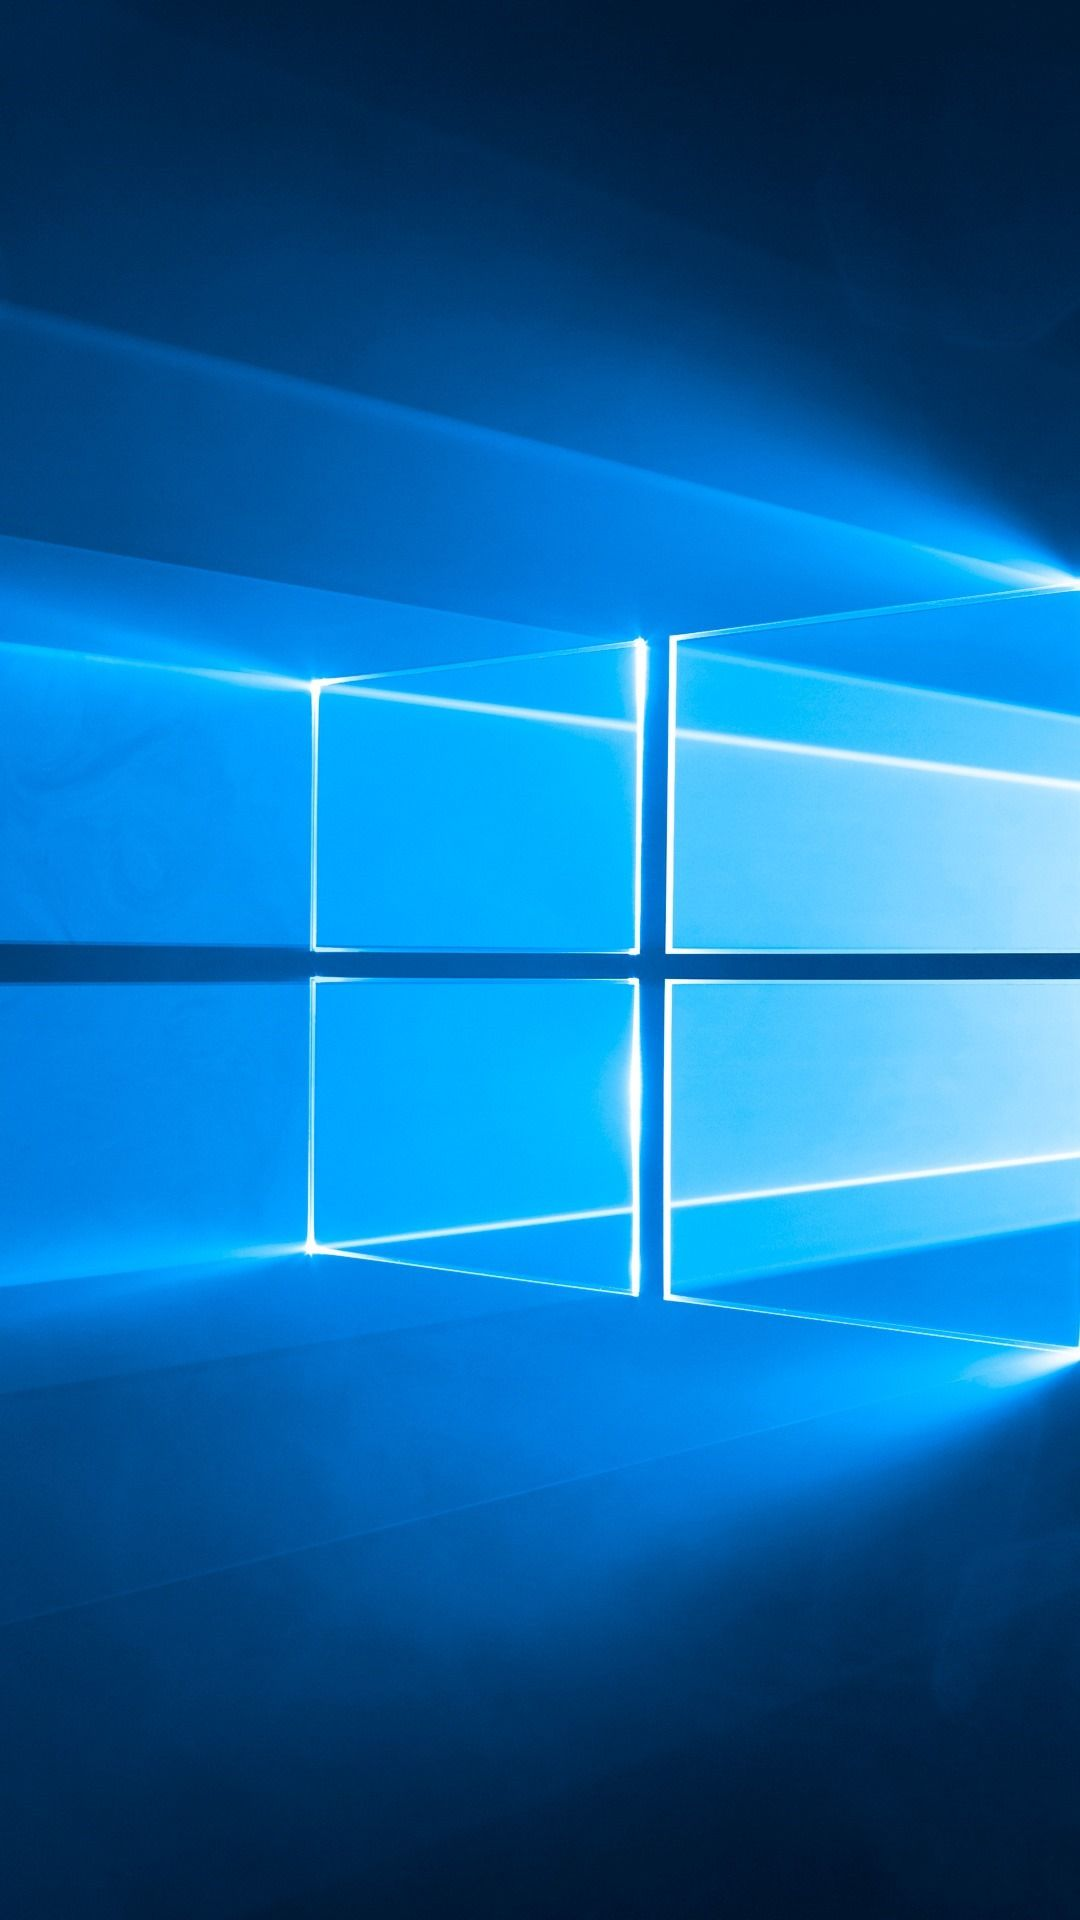 Windows Phone Wallpapers Top Free Windows Phone